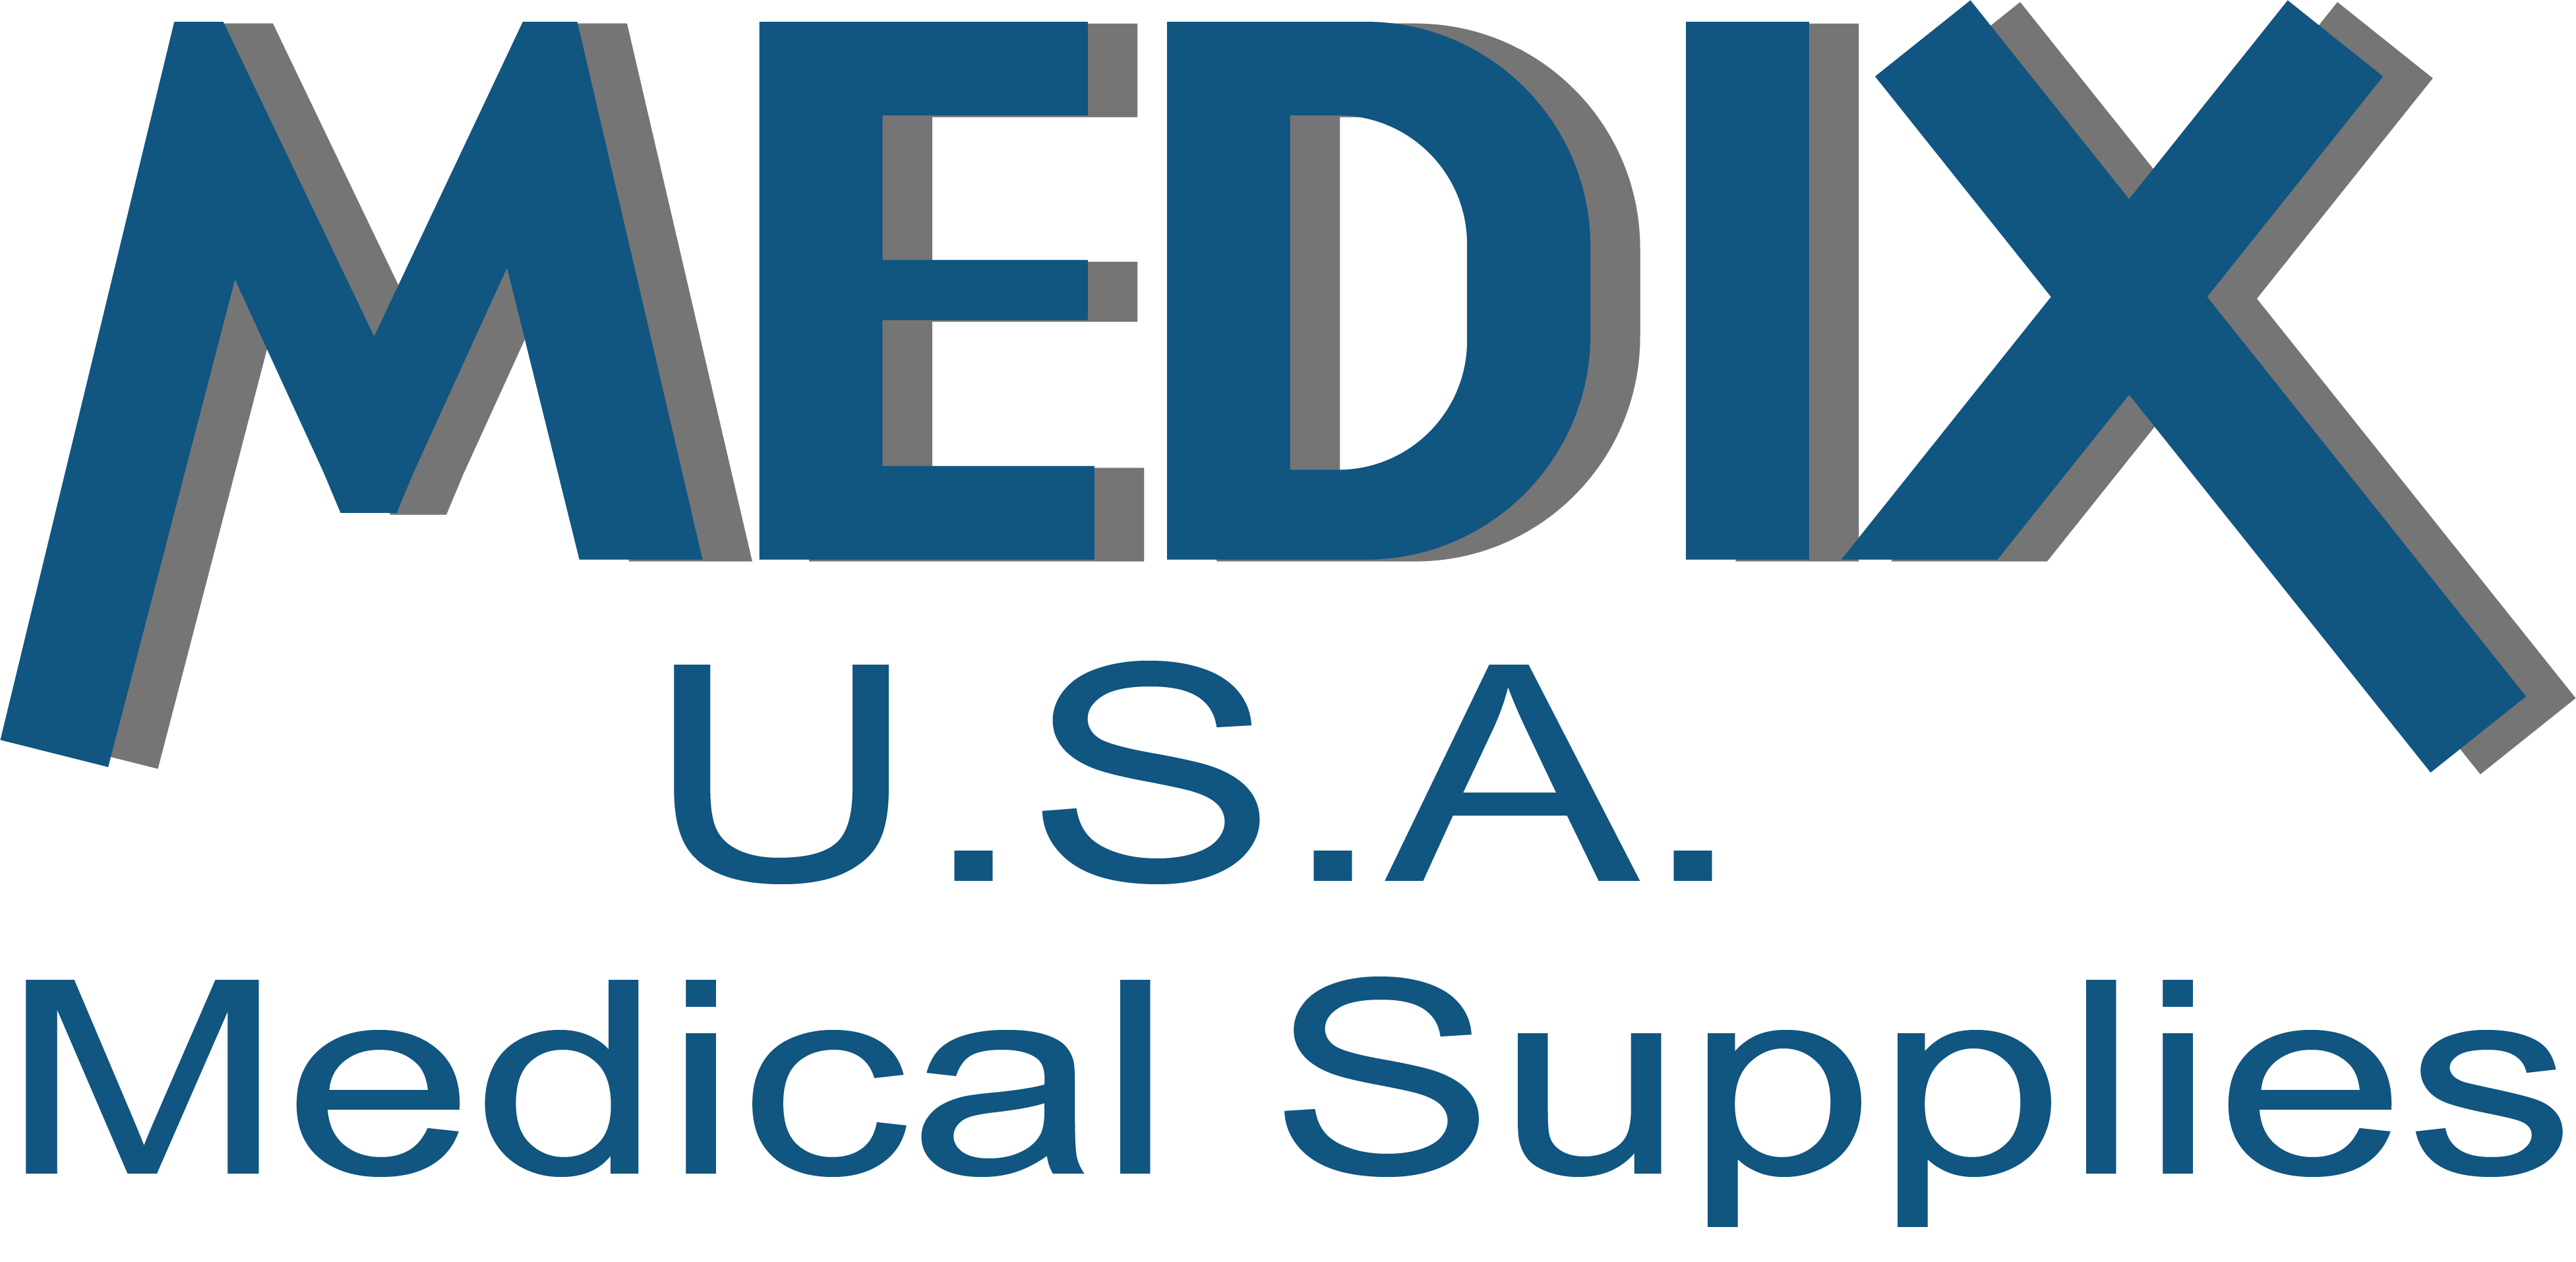 MedixUSA Medical Supply Gloves Tamarac Wholesale Distributor Florida